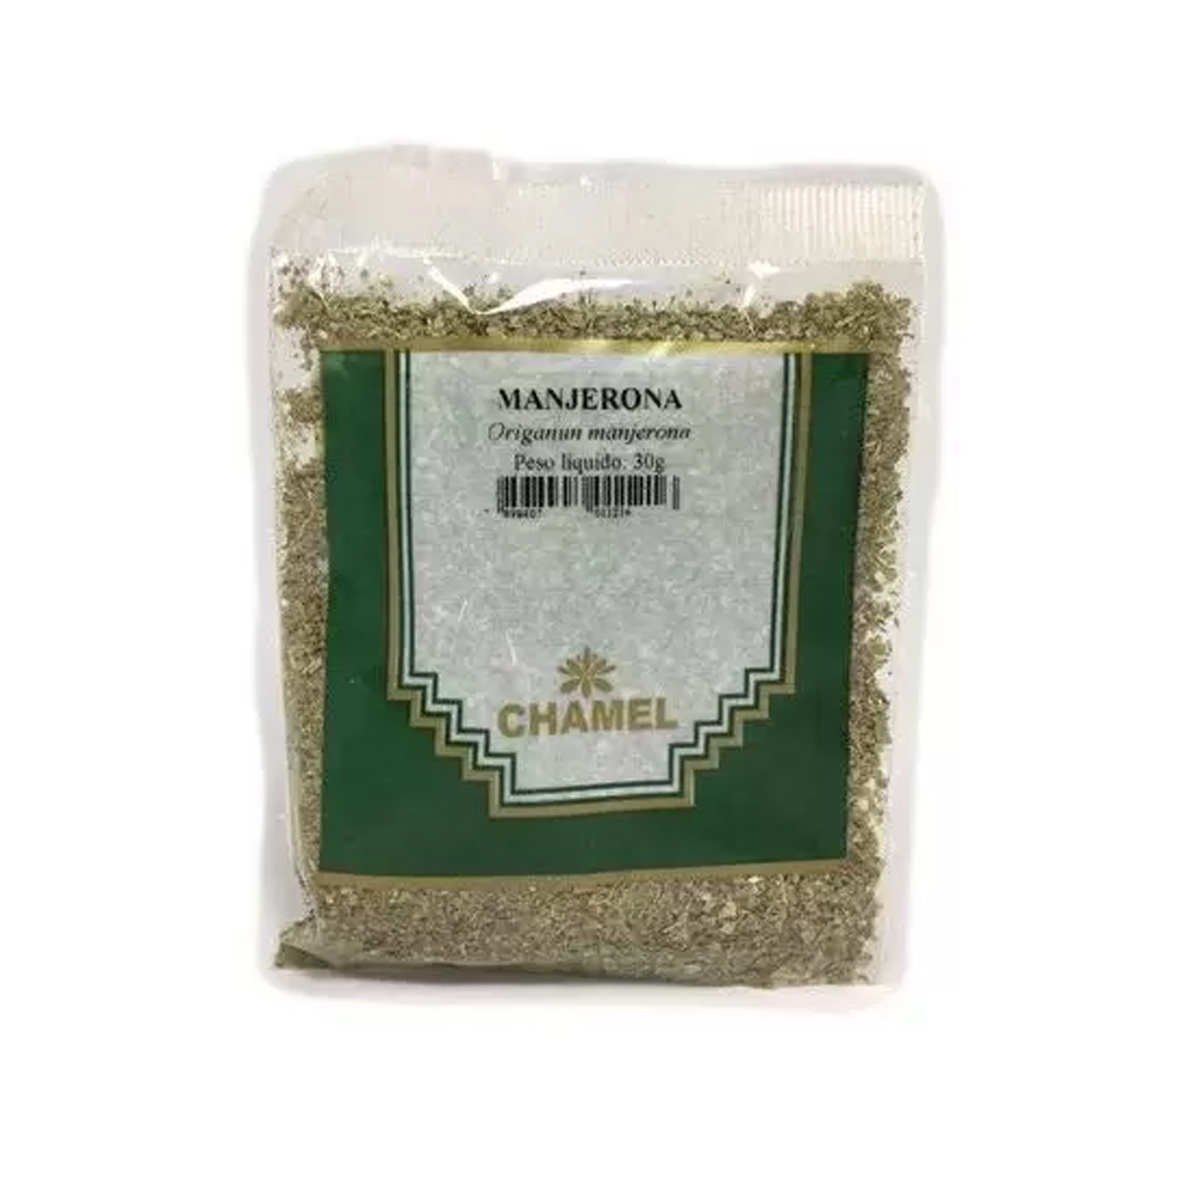 Manjerona 30g - Chamel